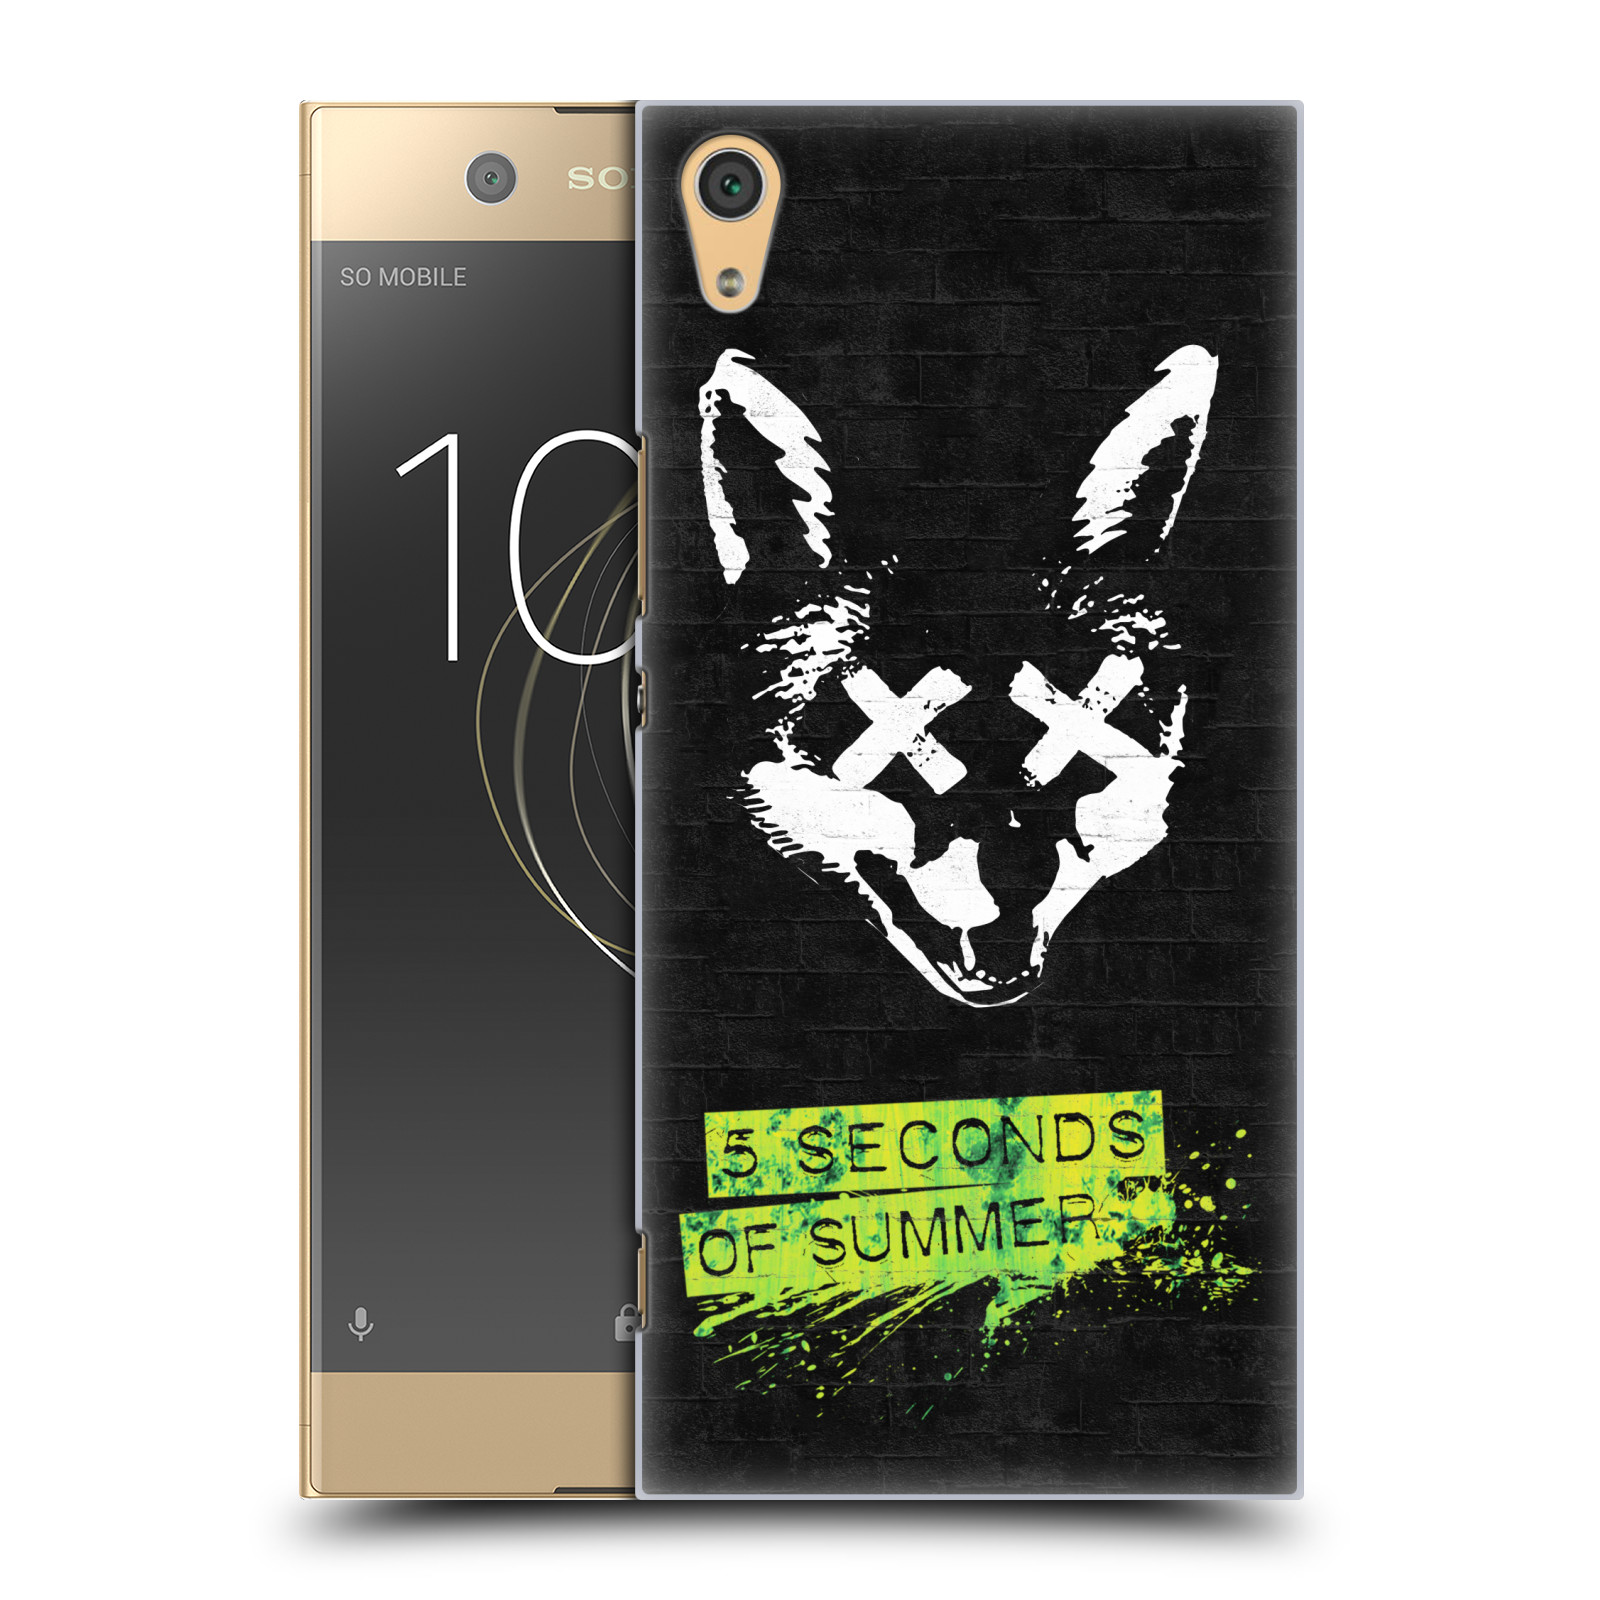 Plastové pouzdro na mobil Sony Xperia XA1 Ultra - Head Case - 5 Seconds of Summer - Fox